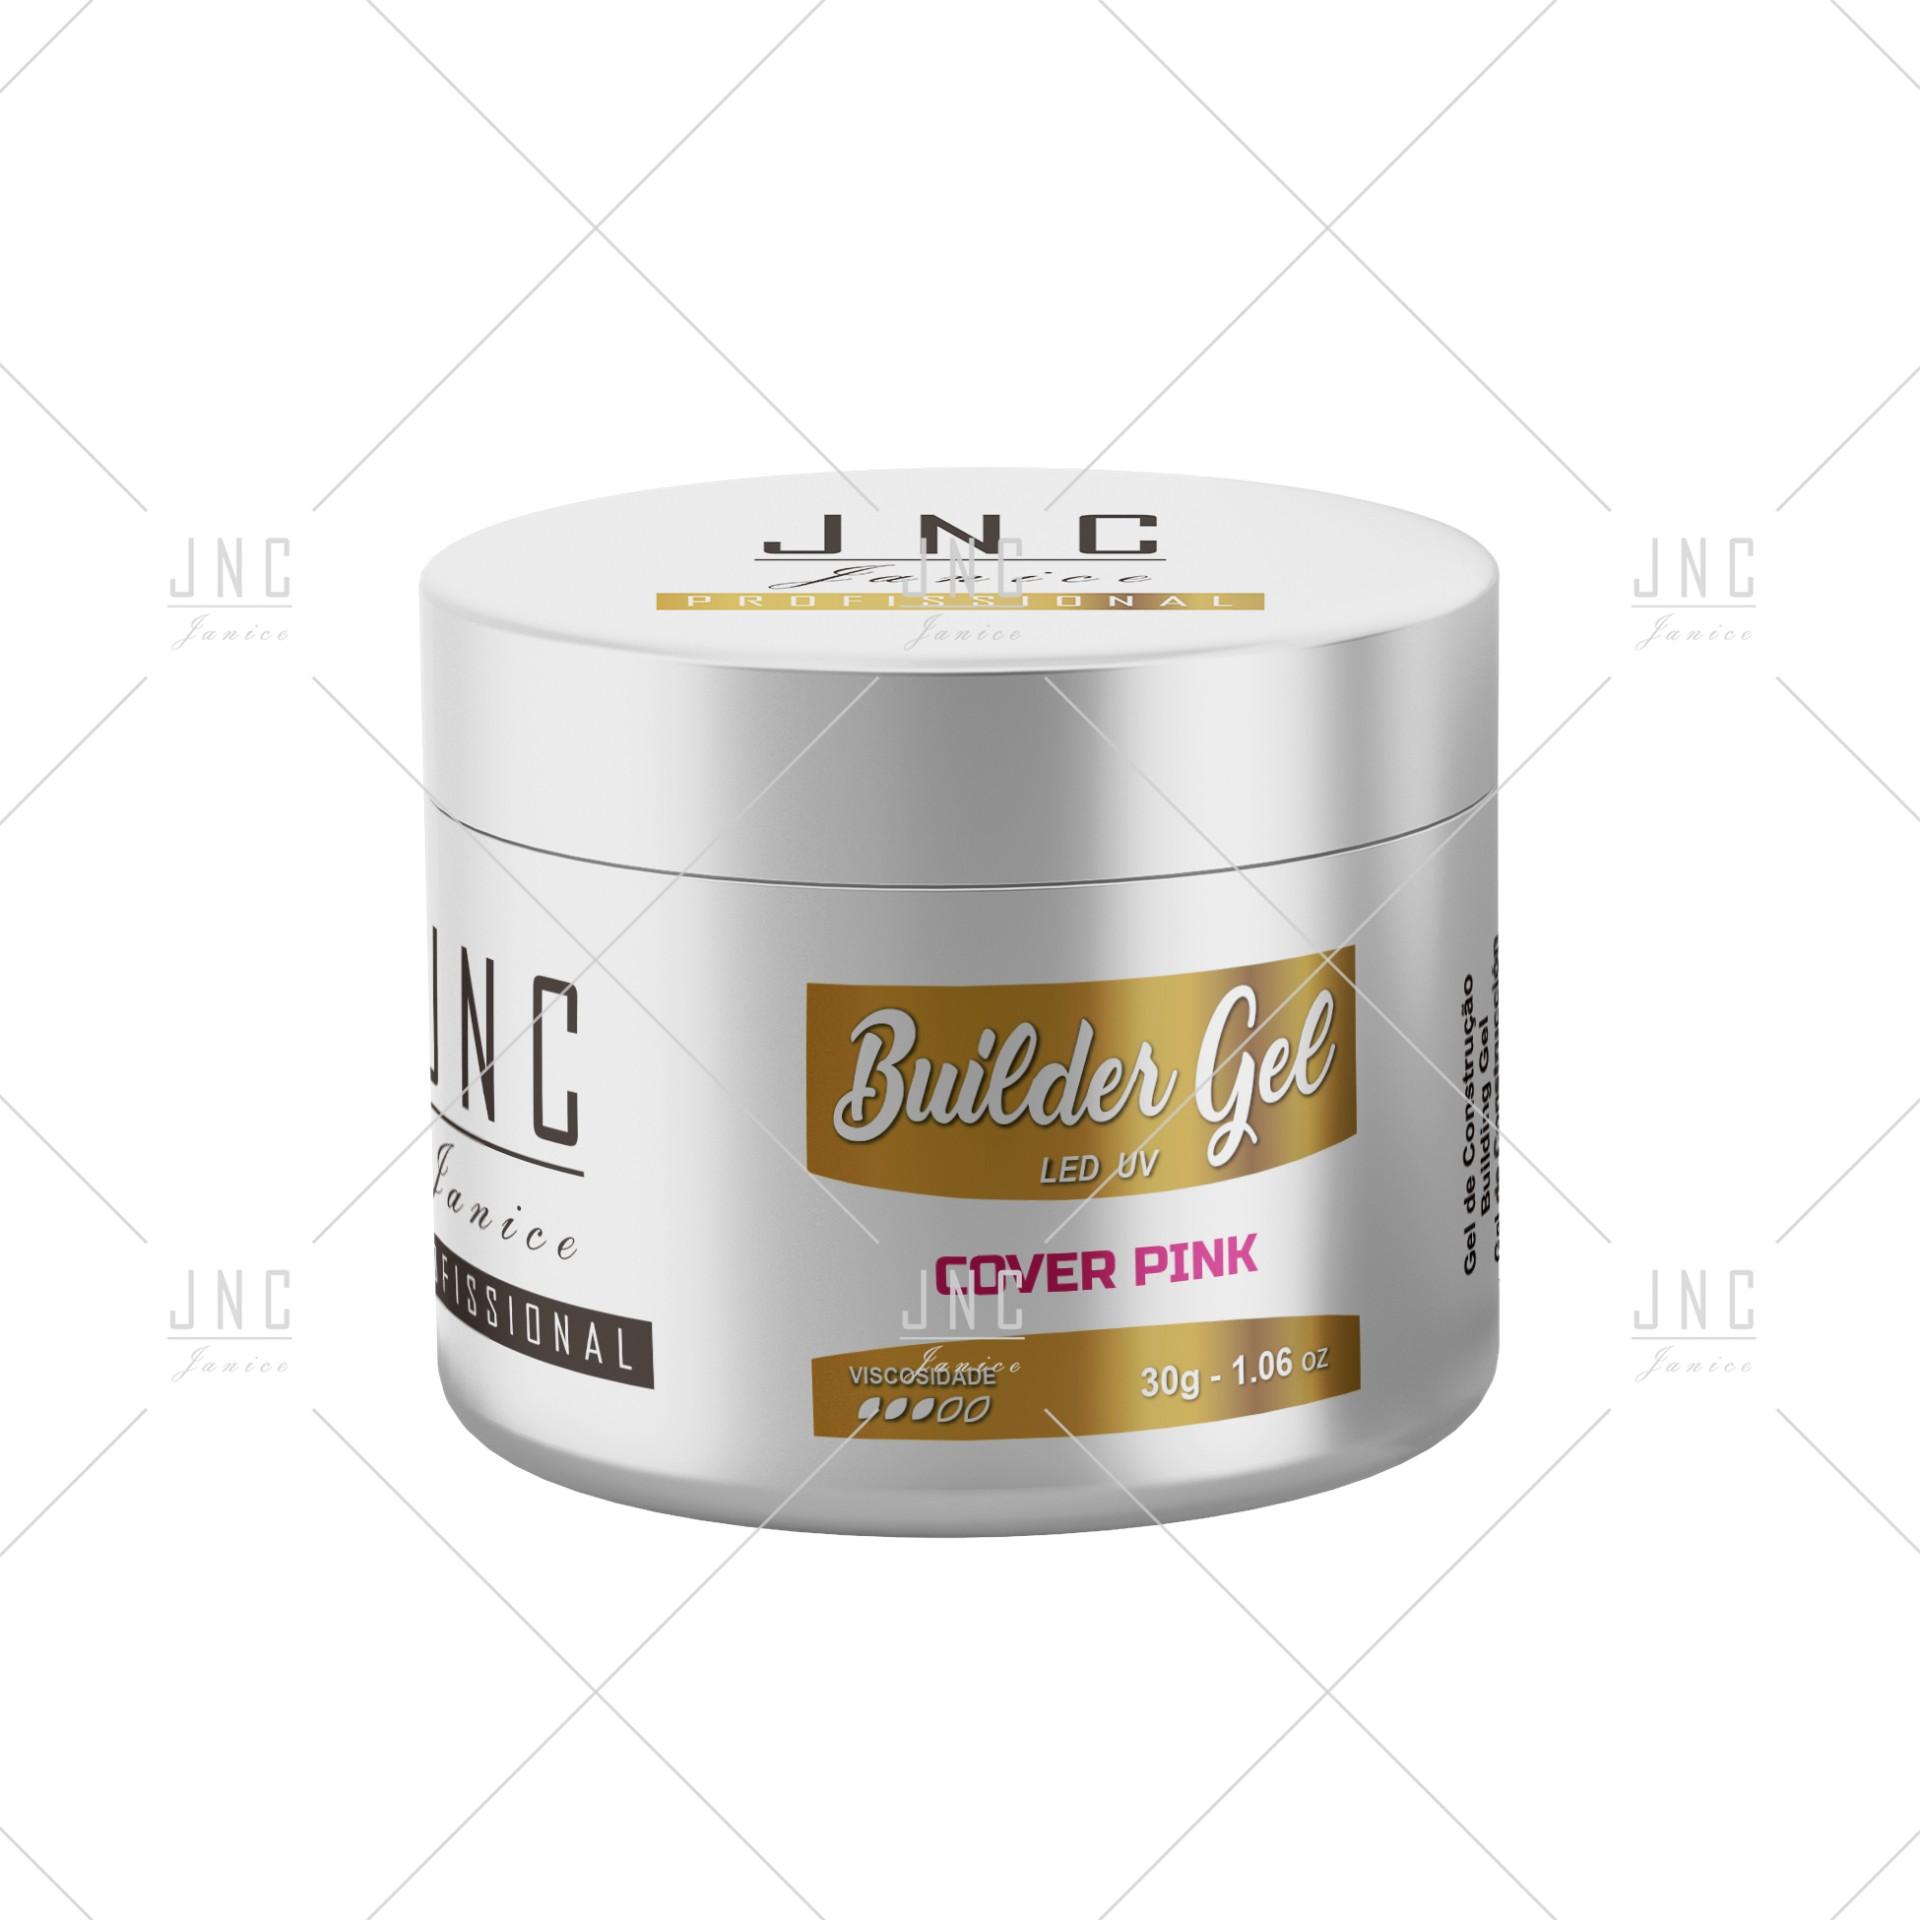 Builder Gel - Cover Pink | Ref.862252